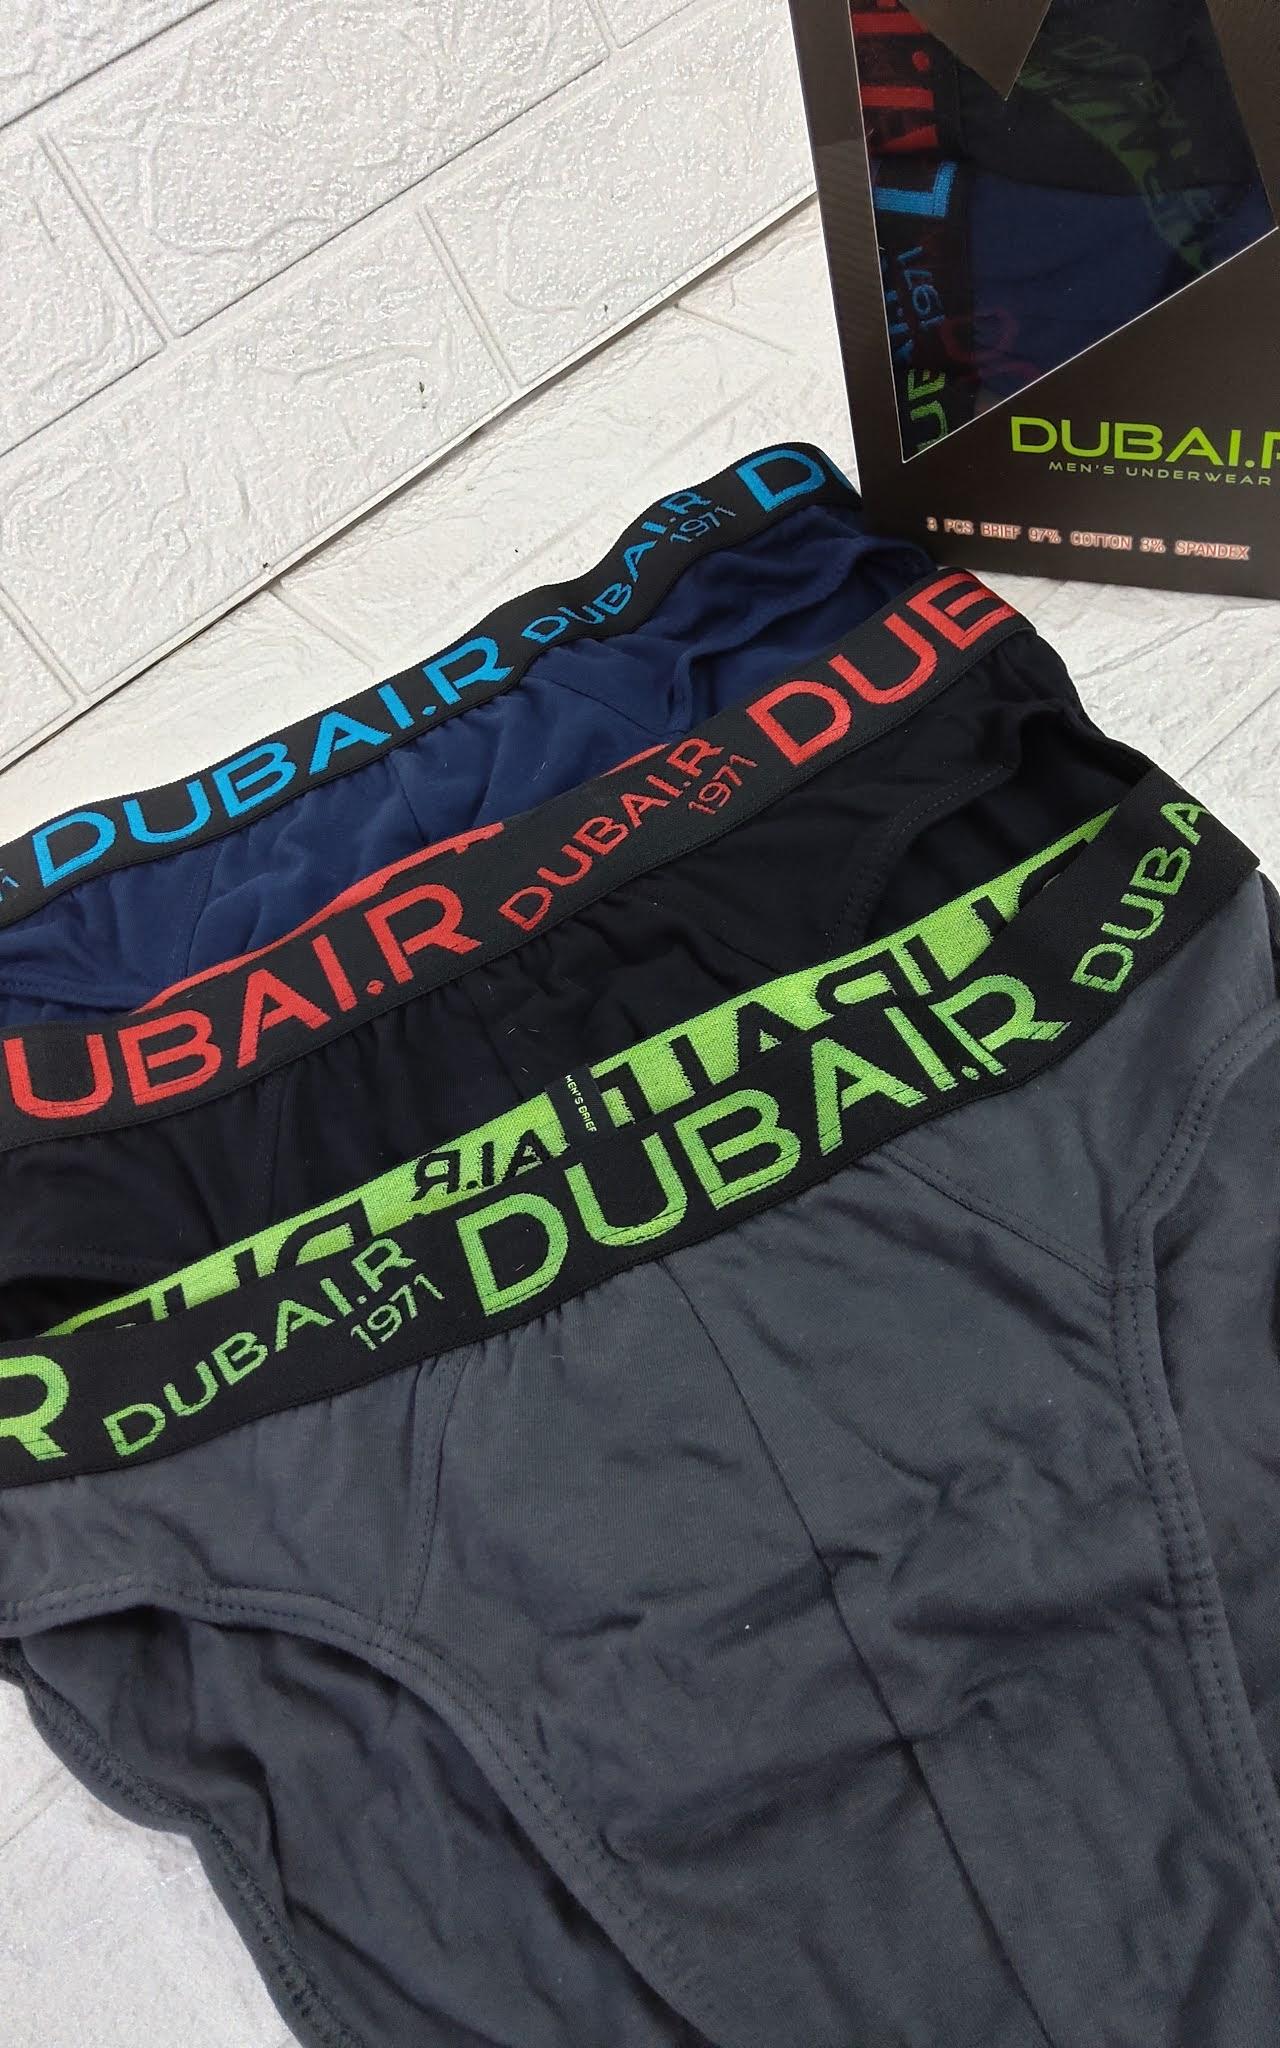 CDL DUBAI.R  (DS3-006) (CDL018)